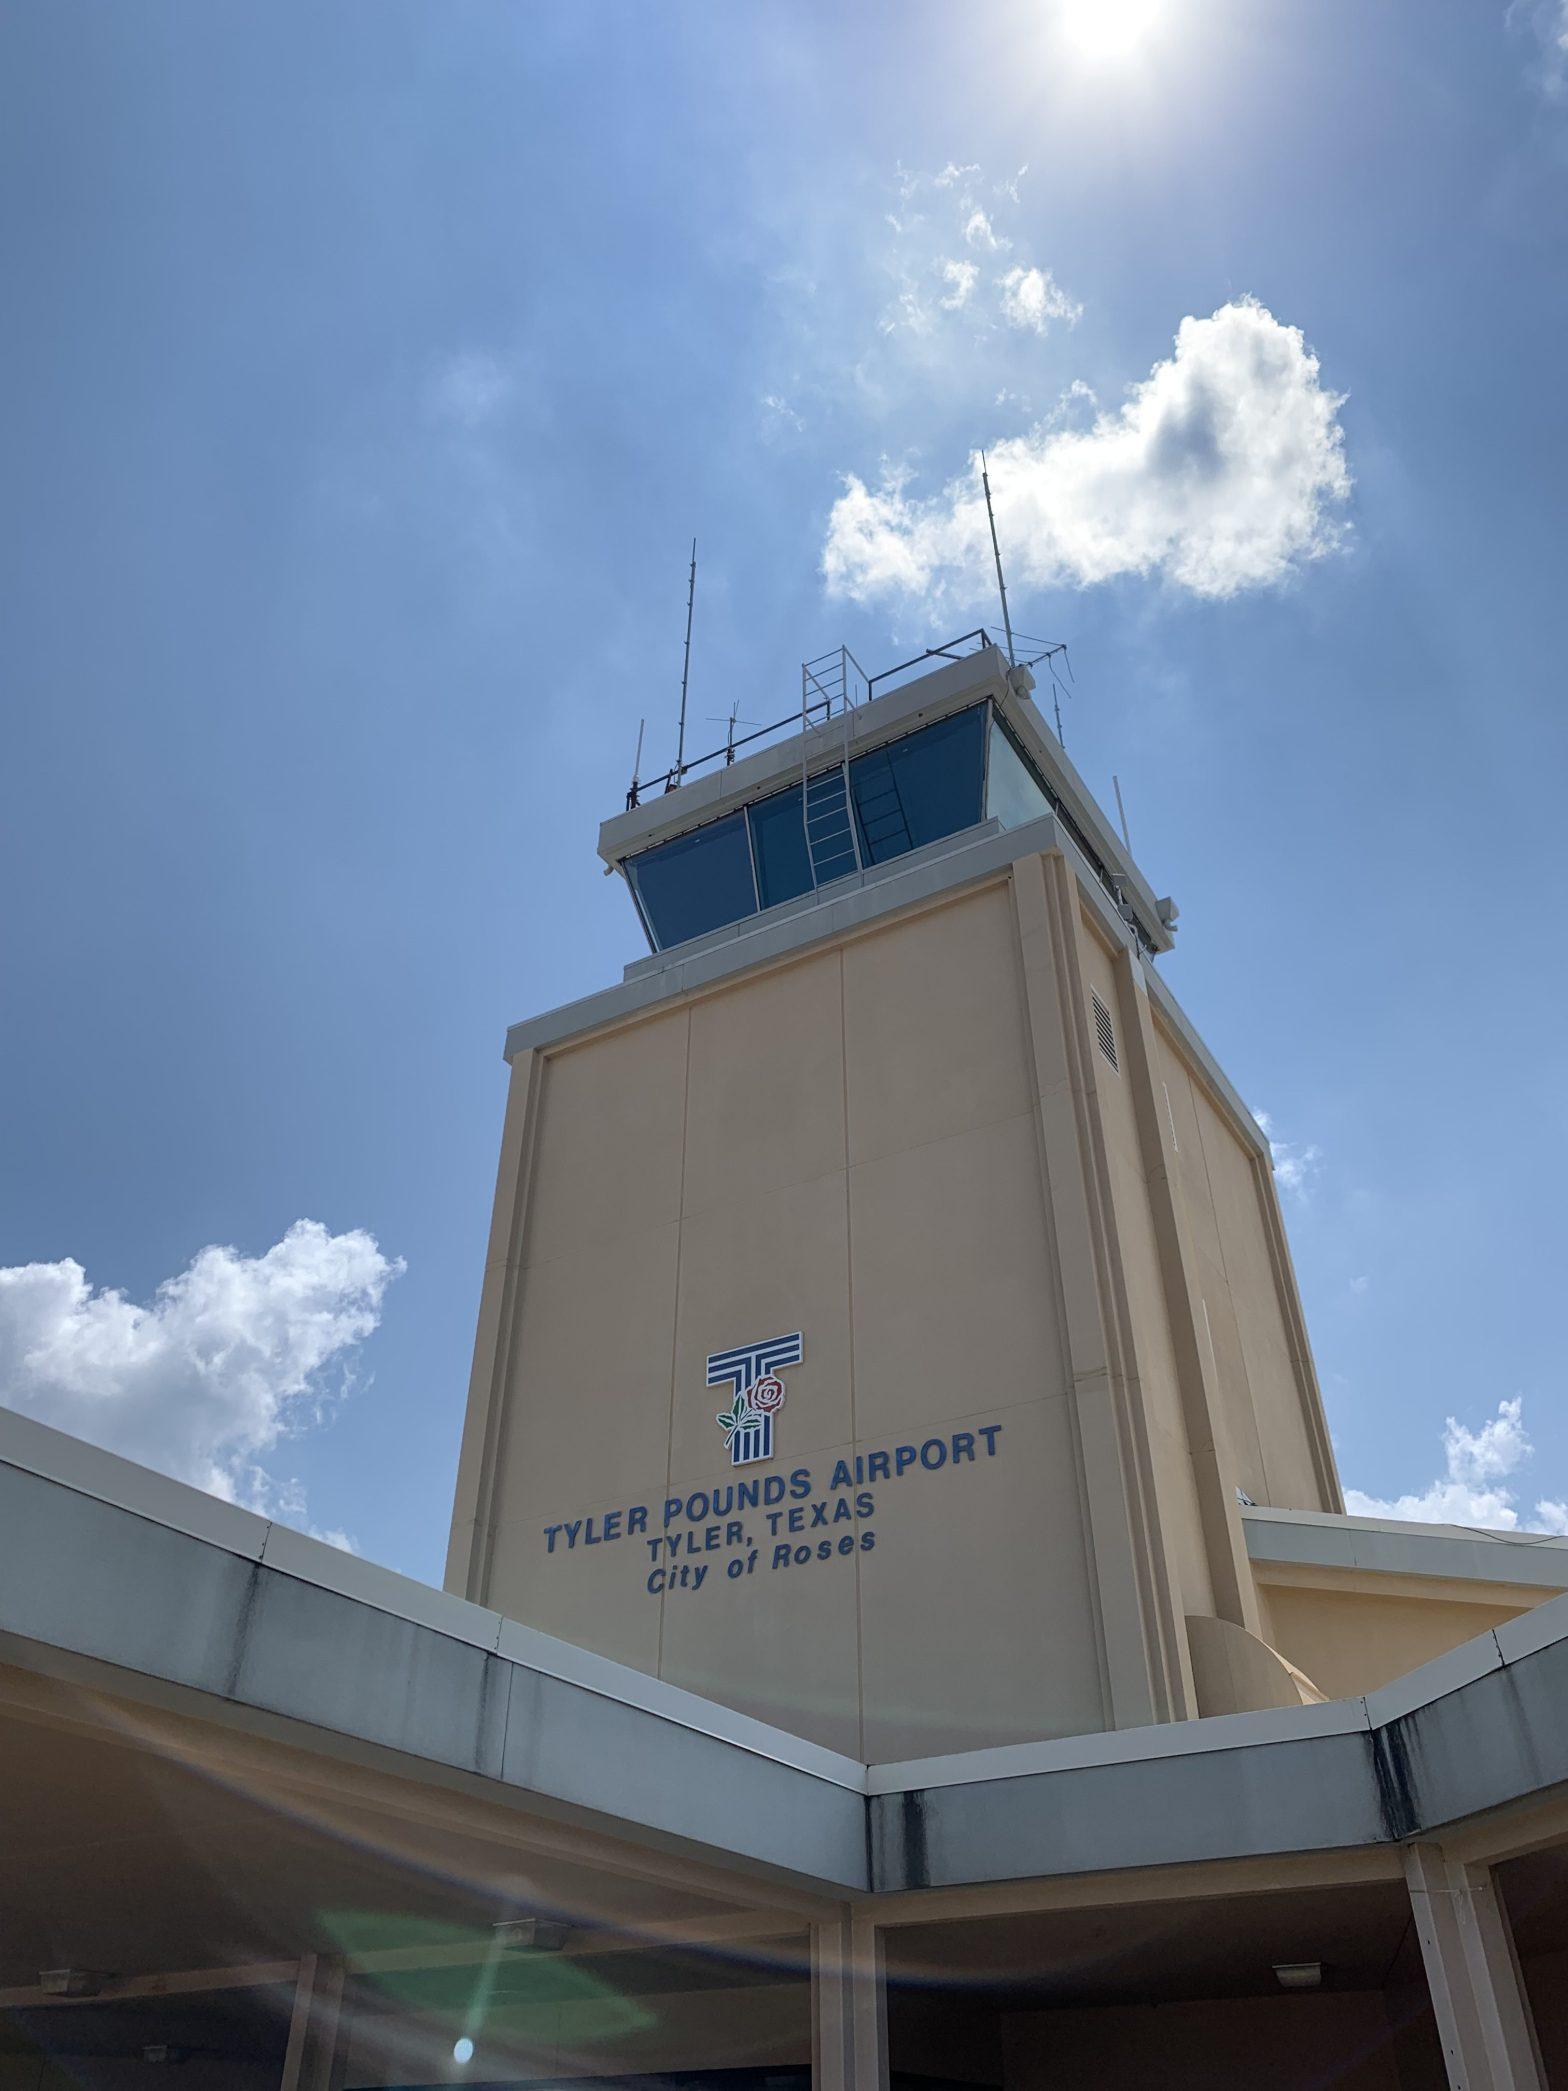 KTYR Air Traffic Control Tower